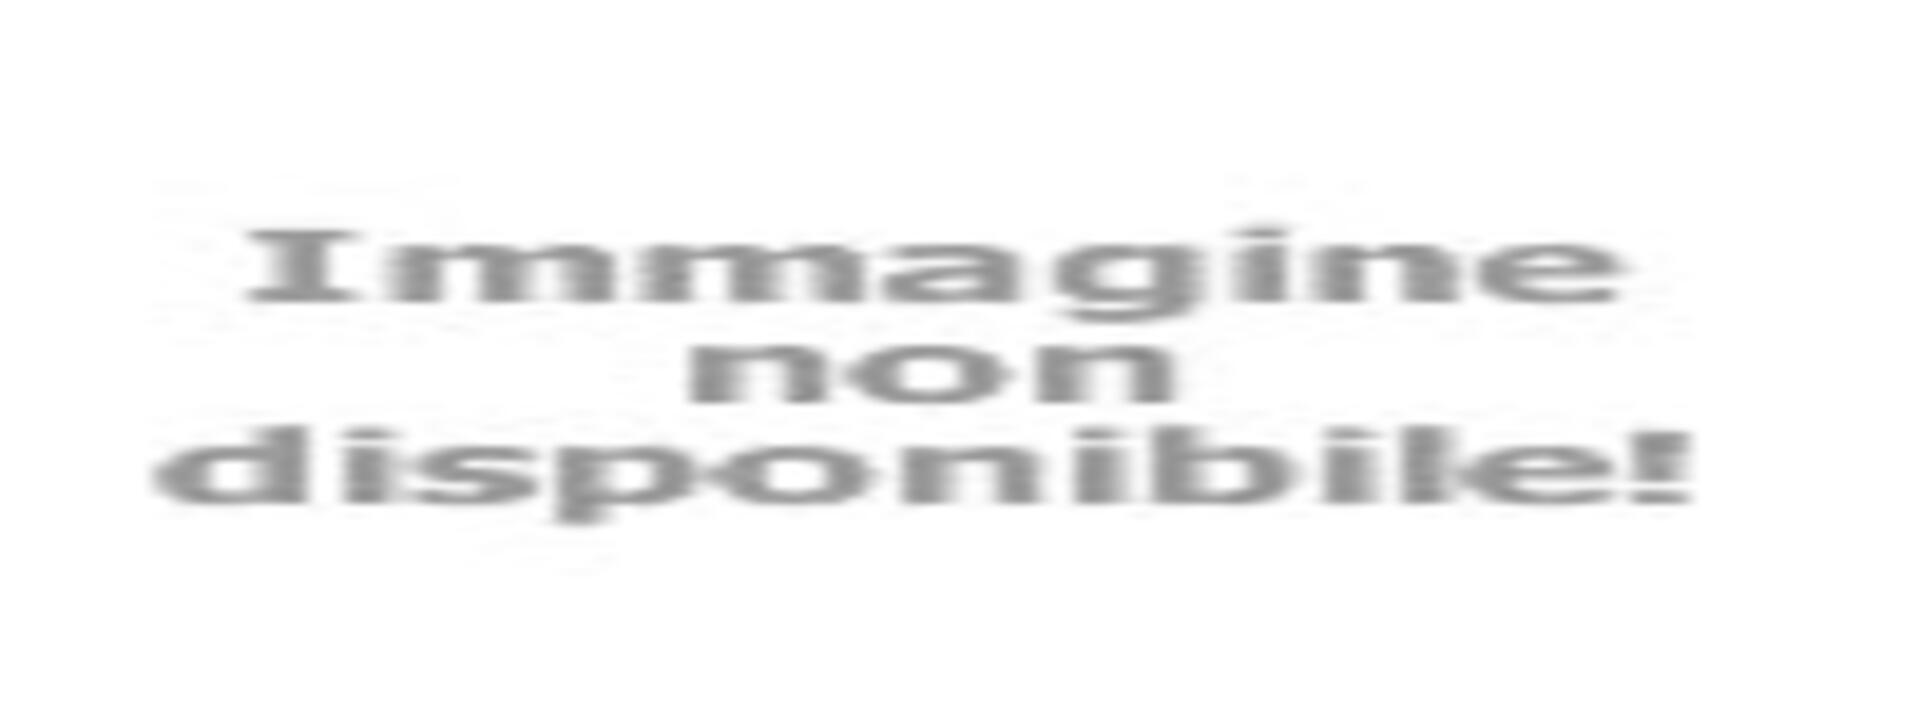 riccionepiadina it piadina-kamut-bio 002